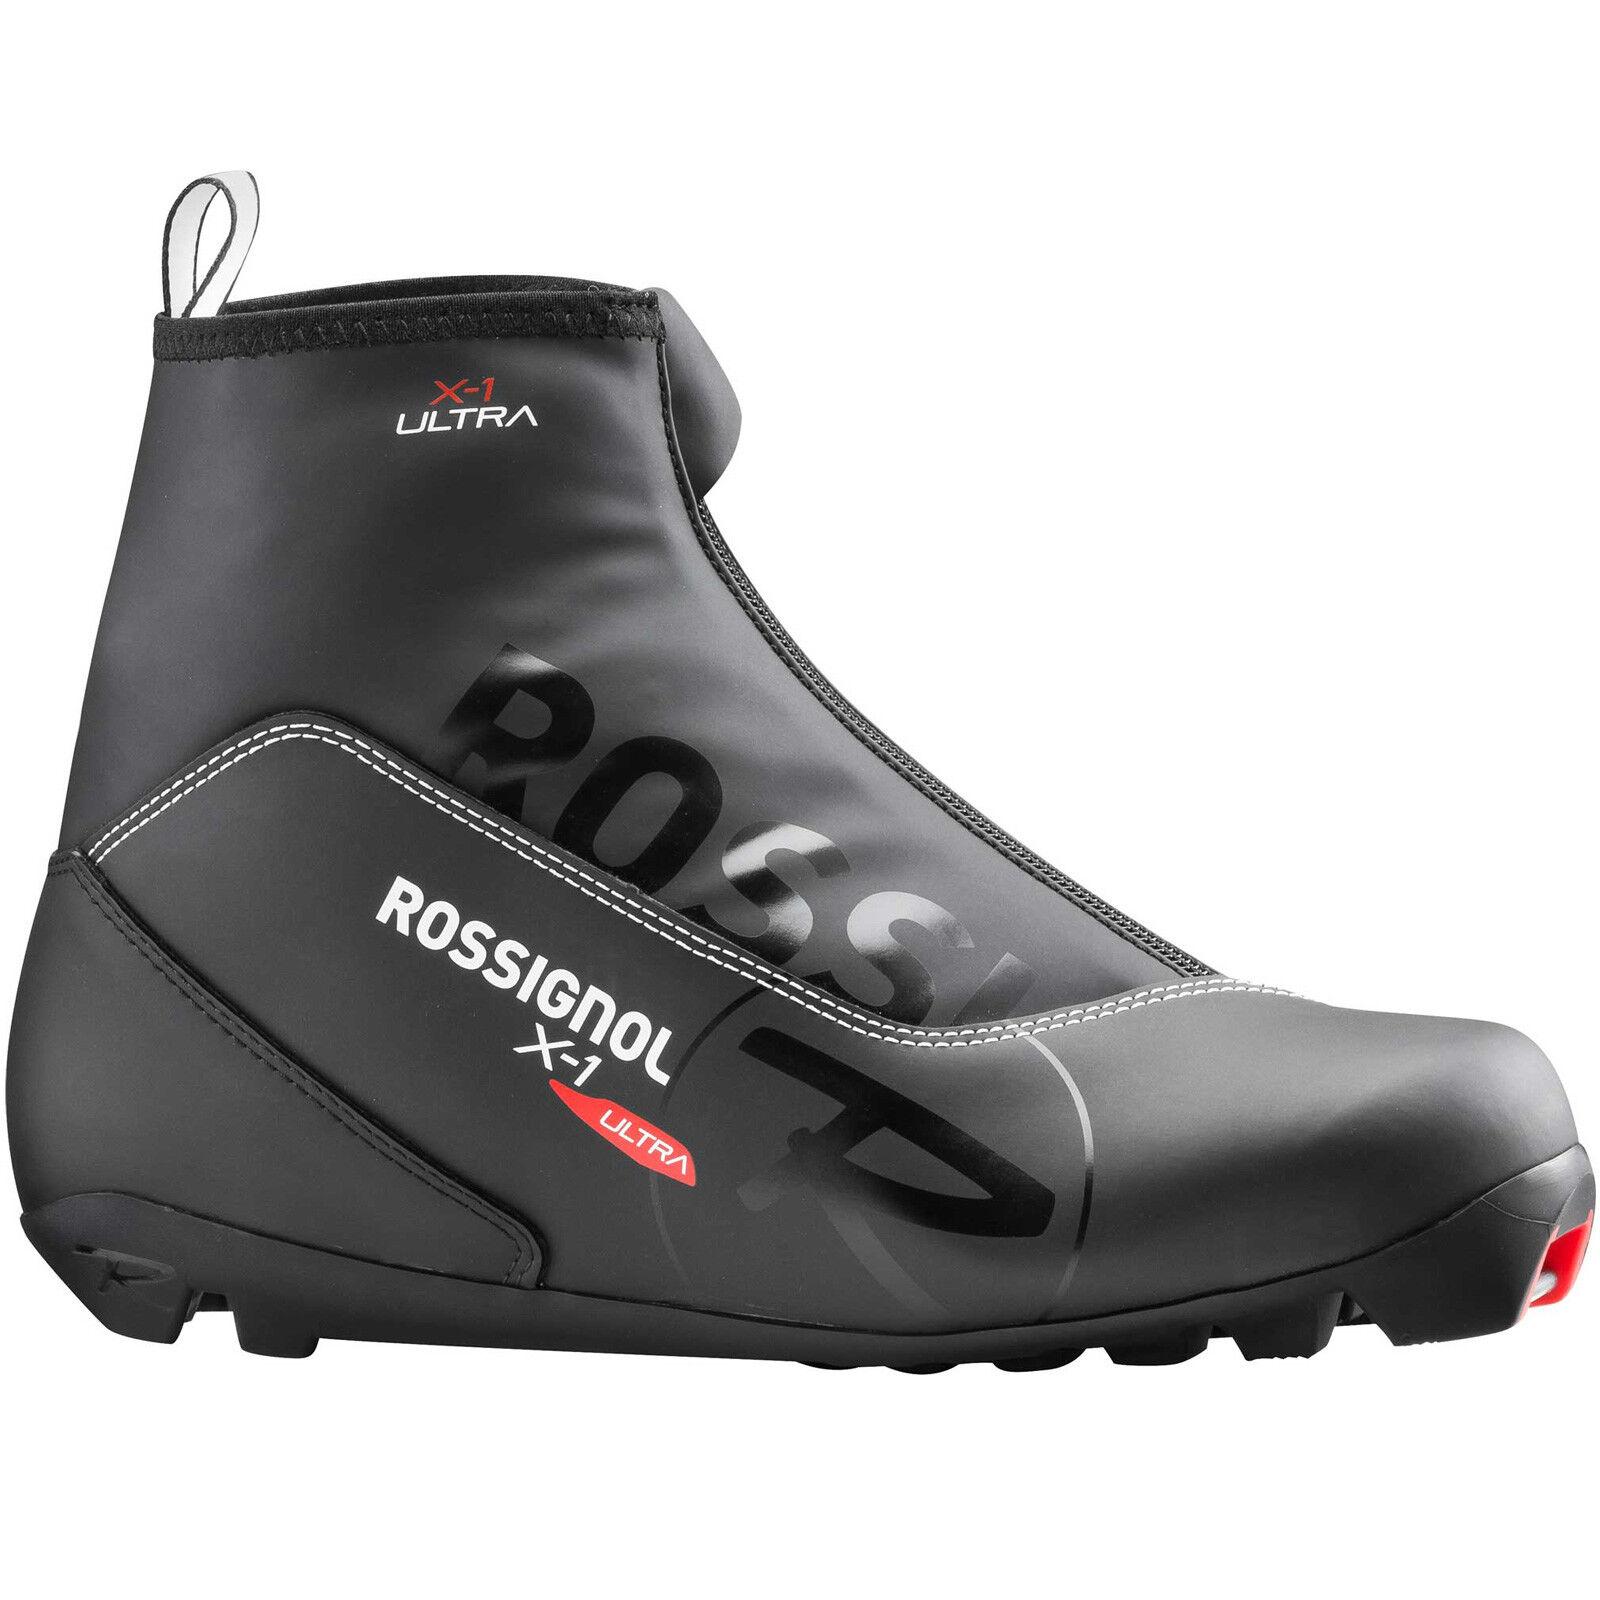 Rossignol X-1 Ultra Unisex Langlaufschuhe Classic Stil Skischuhe Ski-boots NEU